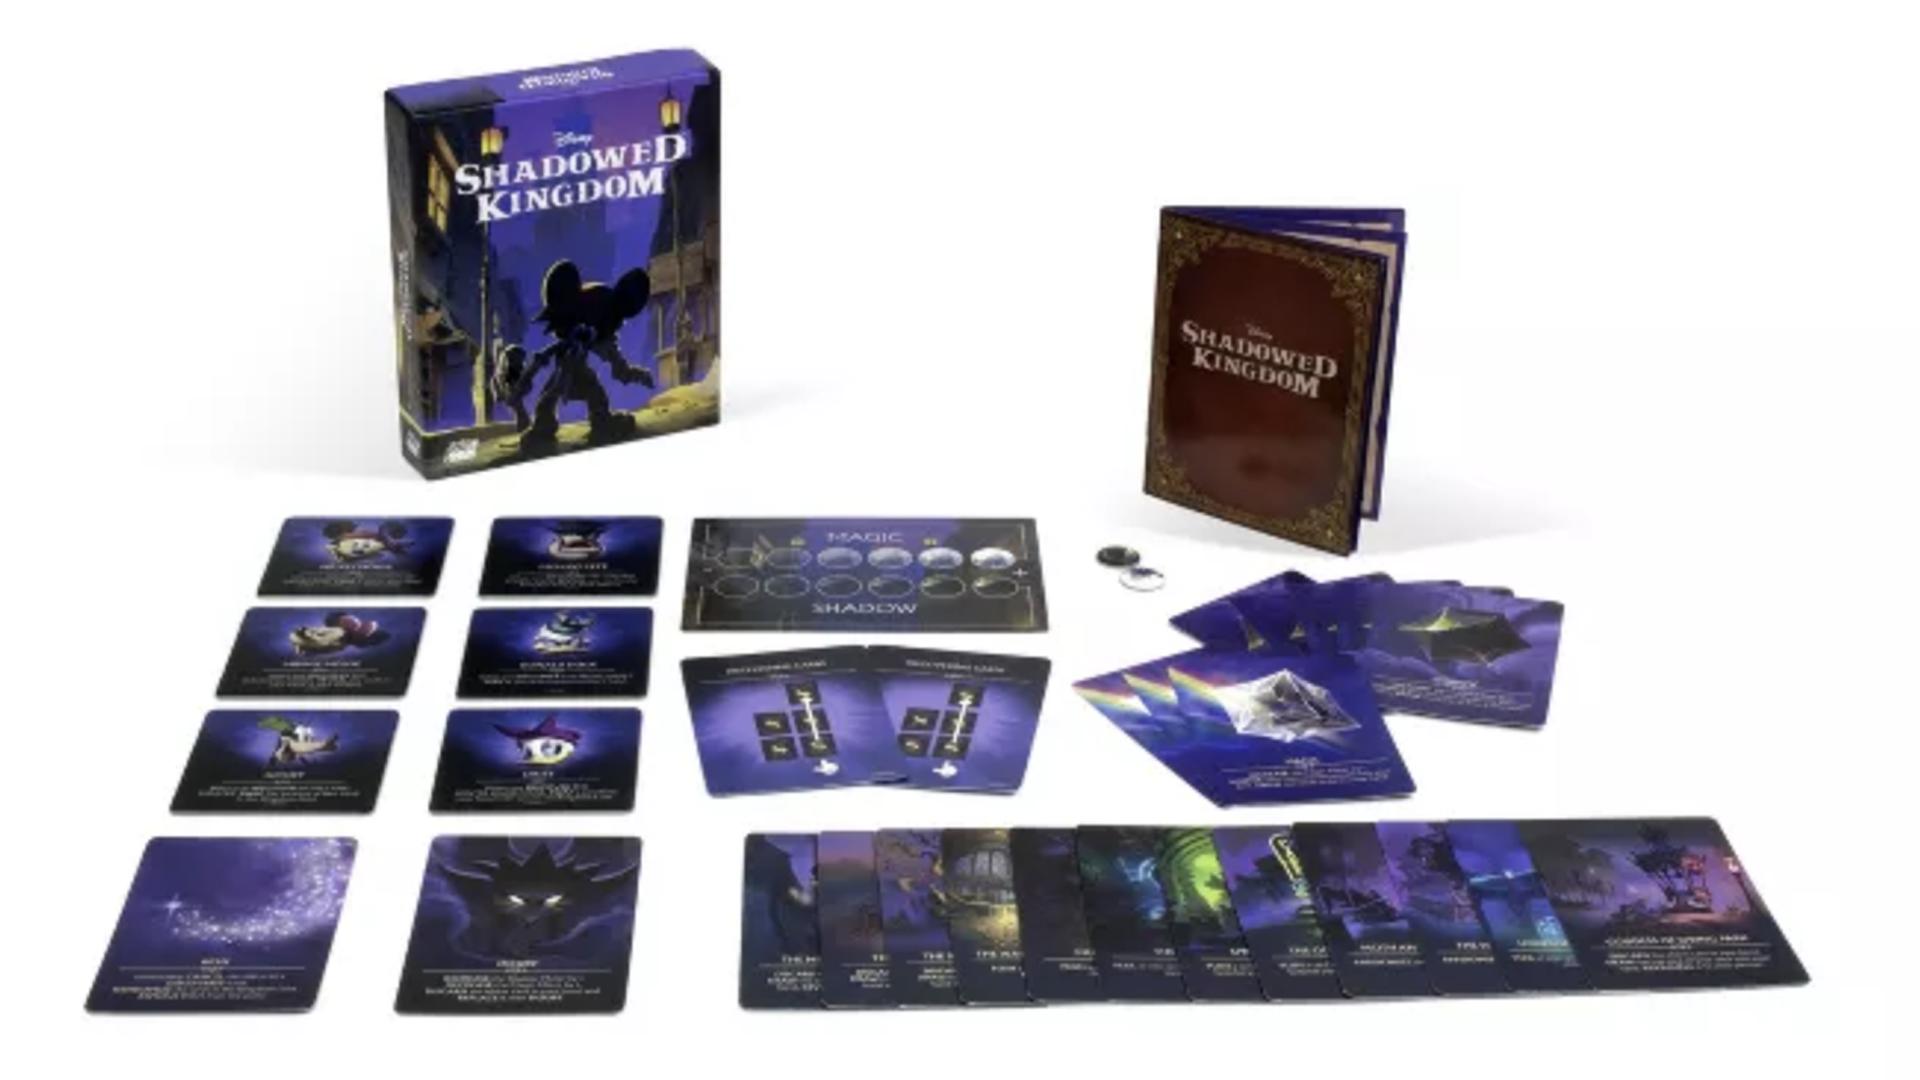 disney-shadowed-kingdom-board-game-layout.png